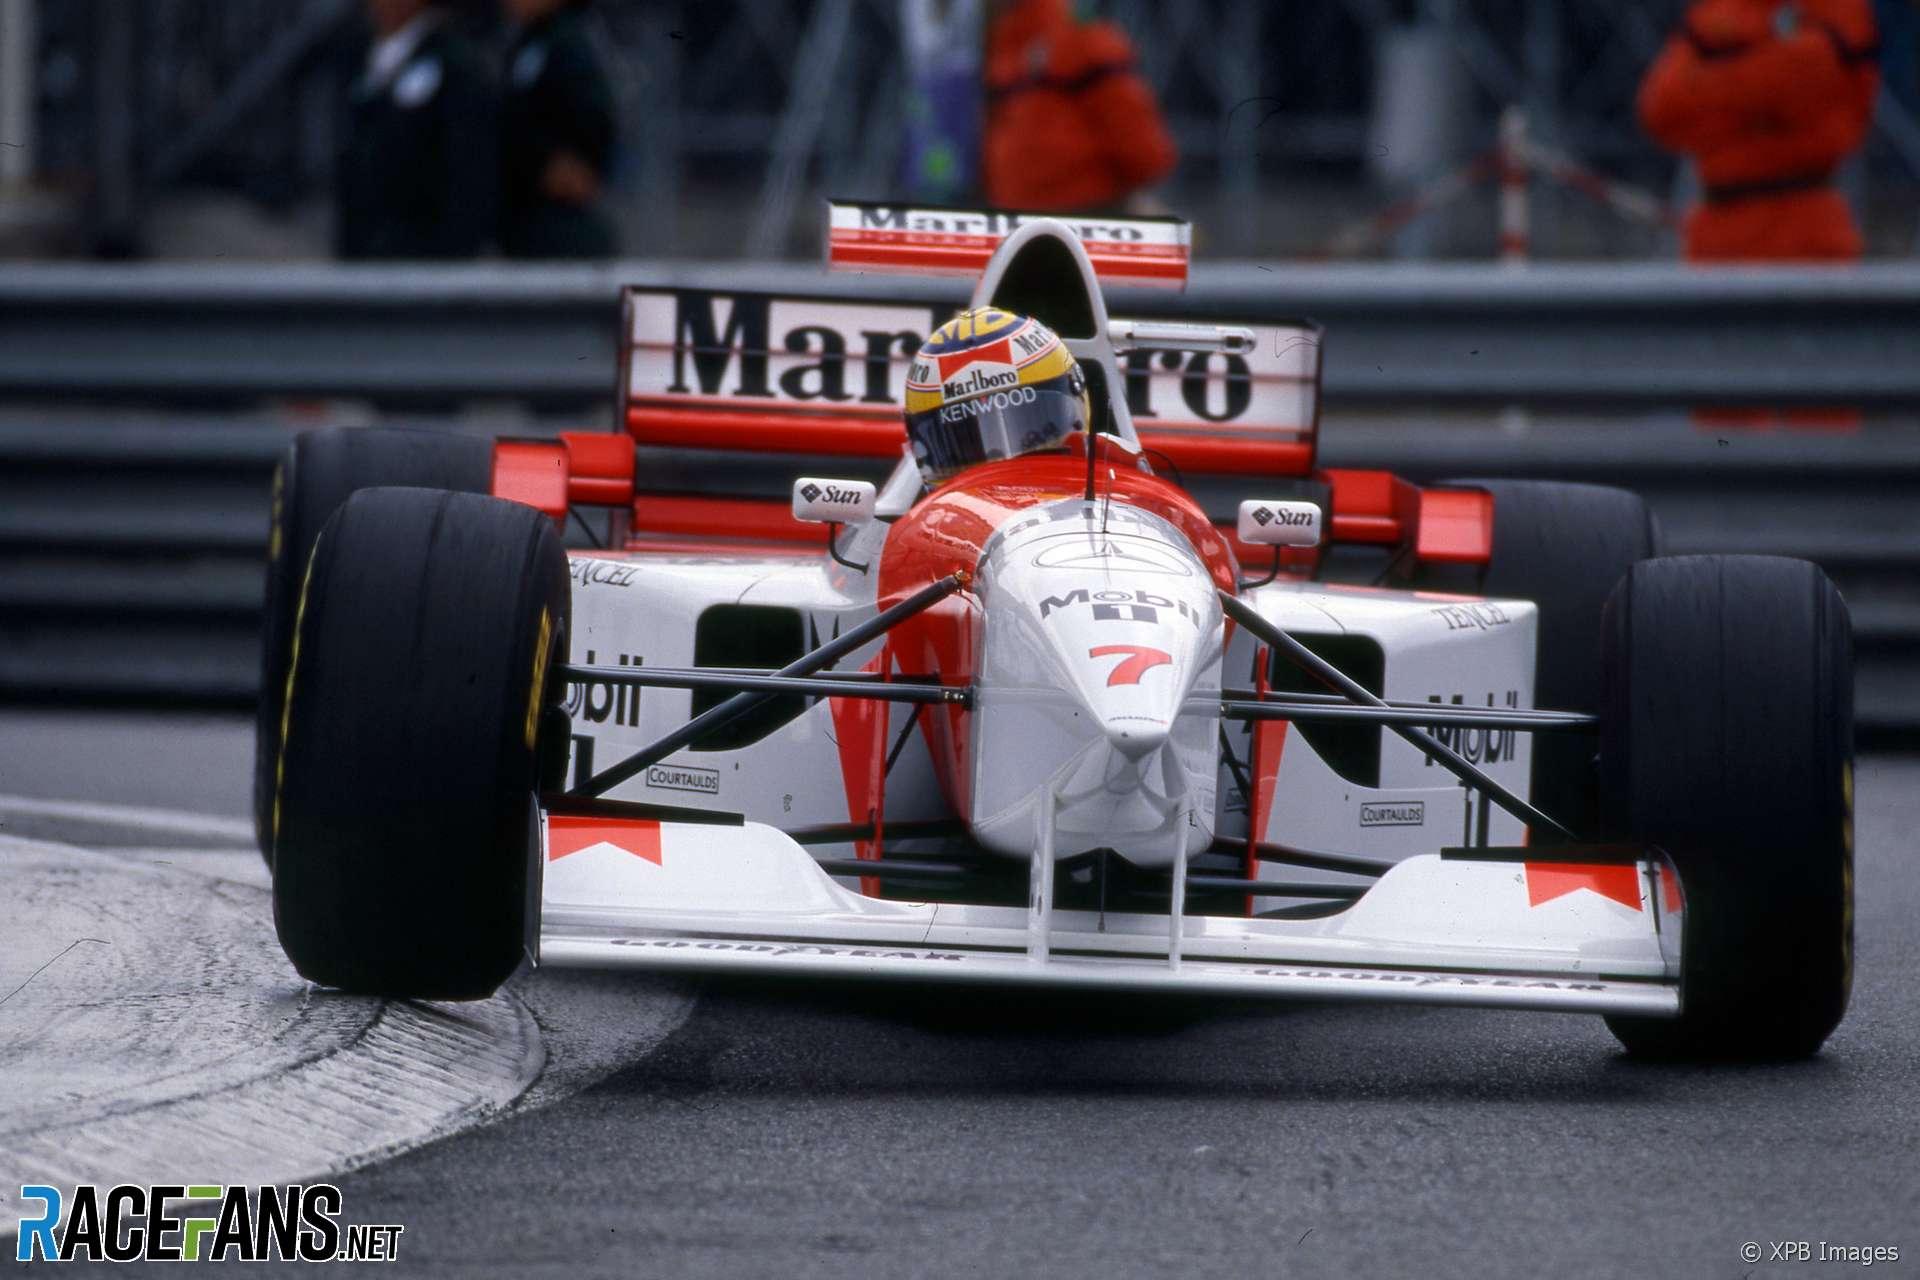 Mark Blundell, McLaren, Monaco, 1995